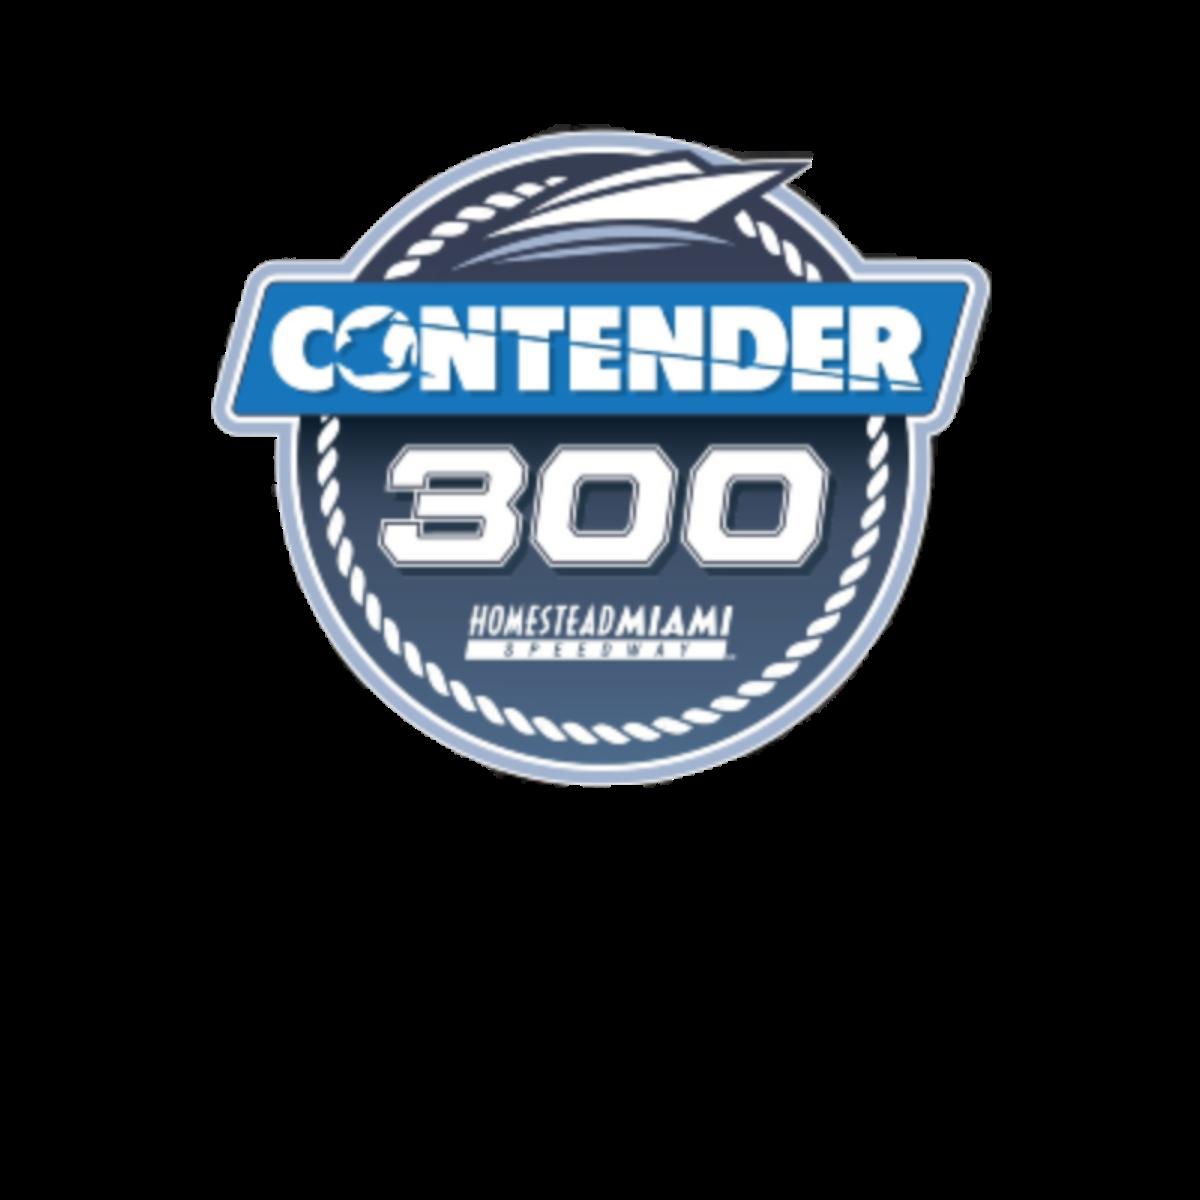 NASCAR Xfinity Series: Contender Boats 300